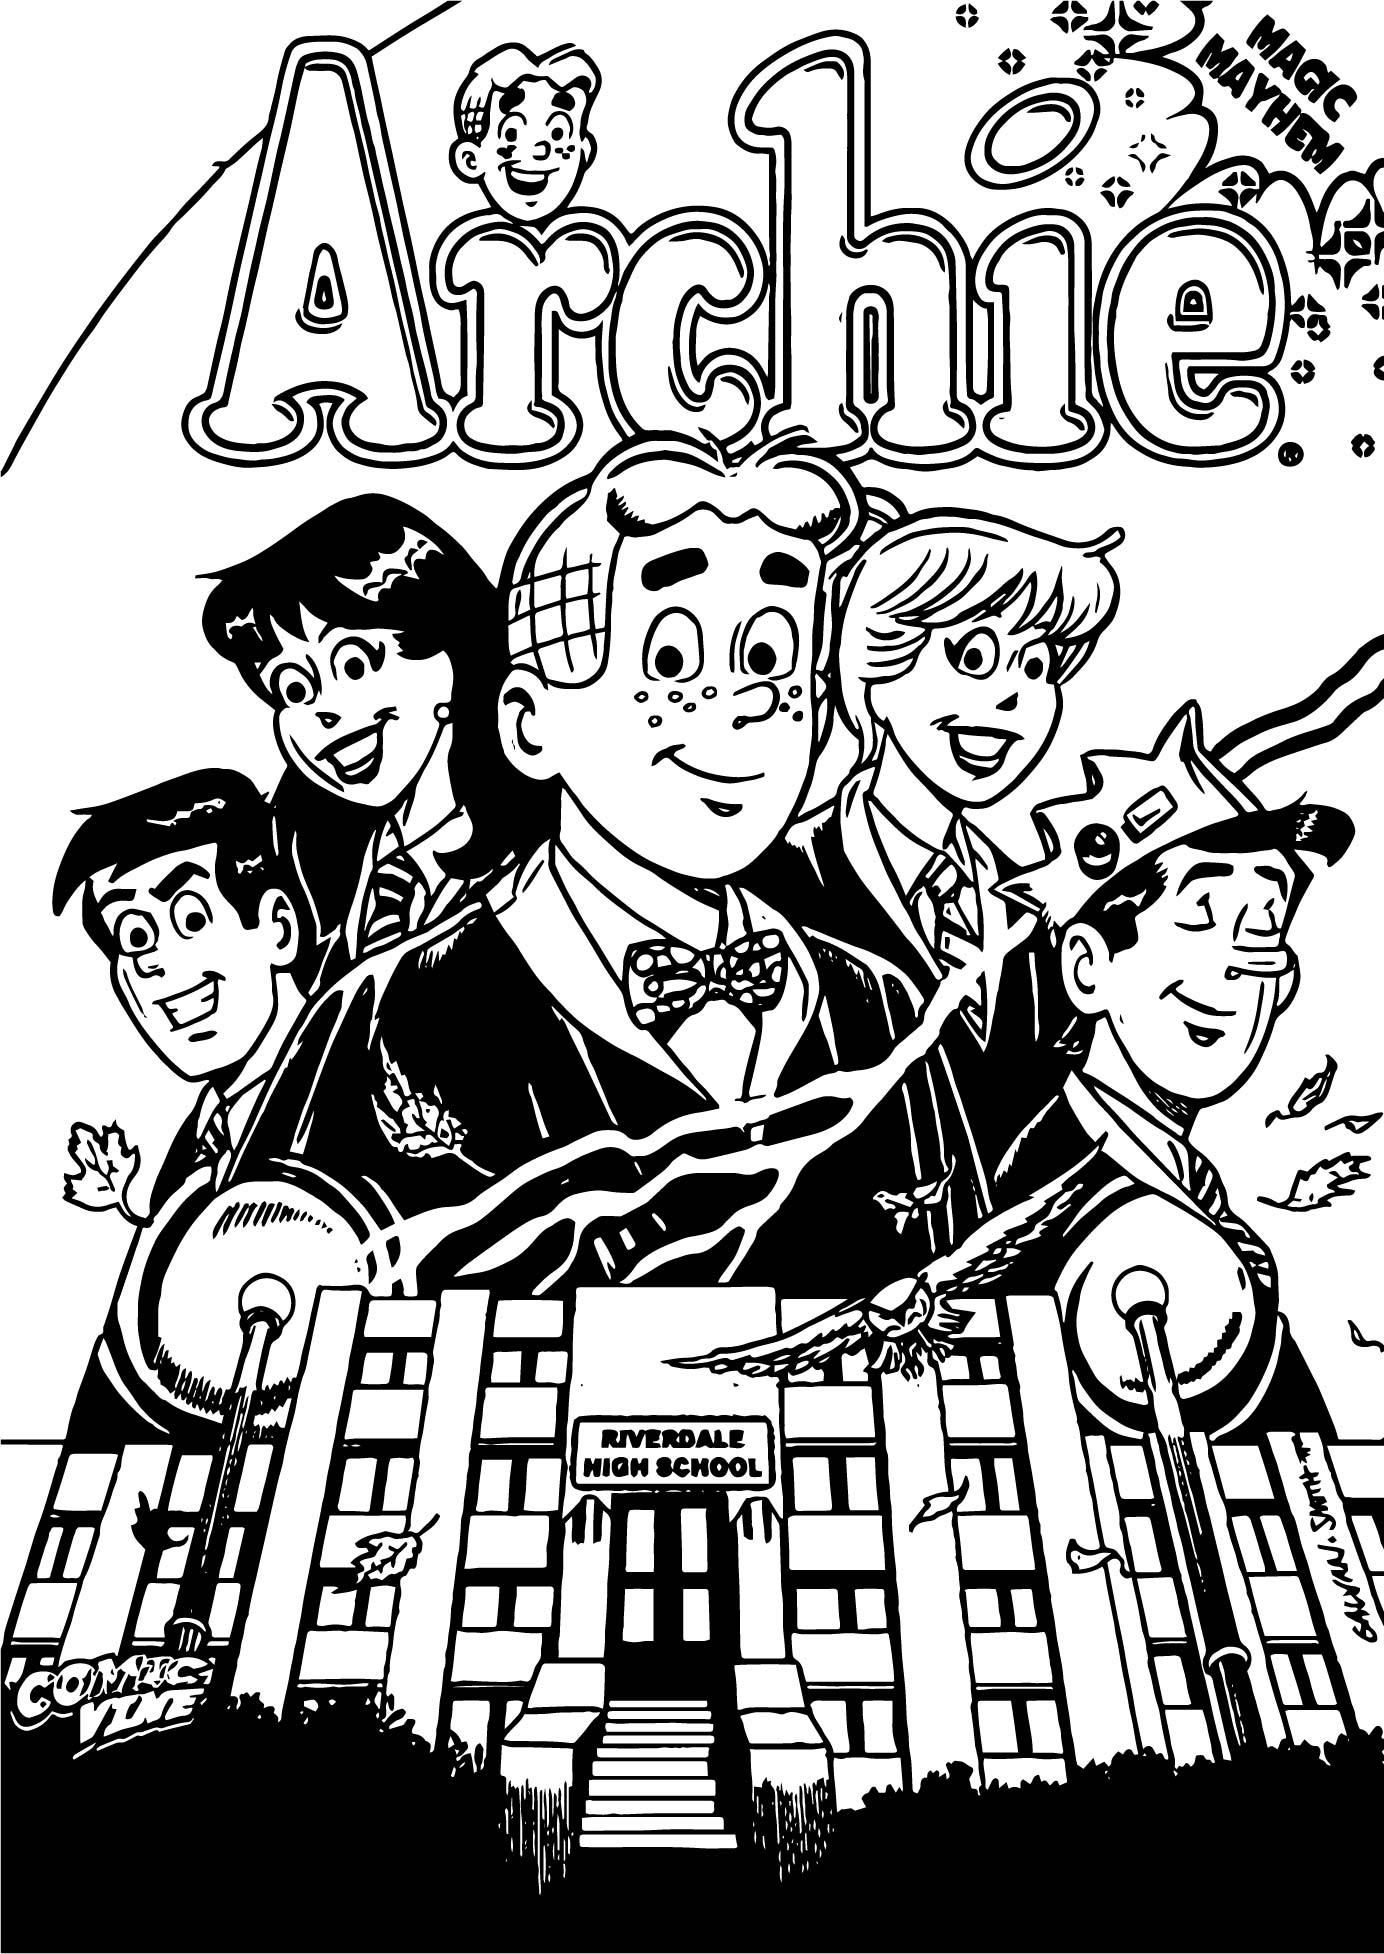 Archie Comics Magic Myhem Coloring Page